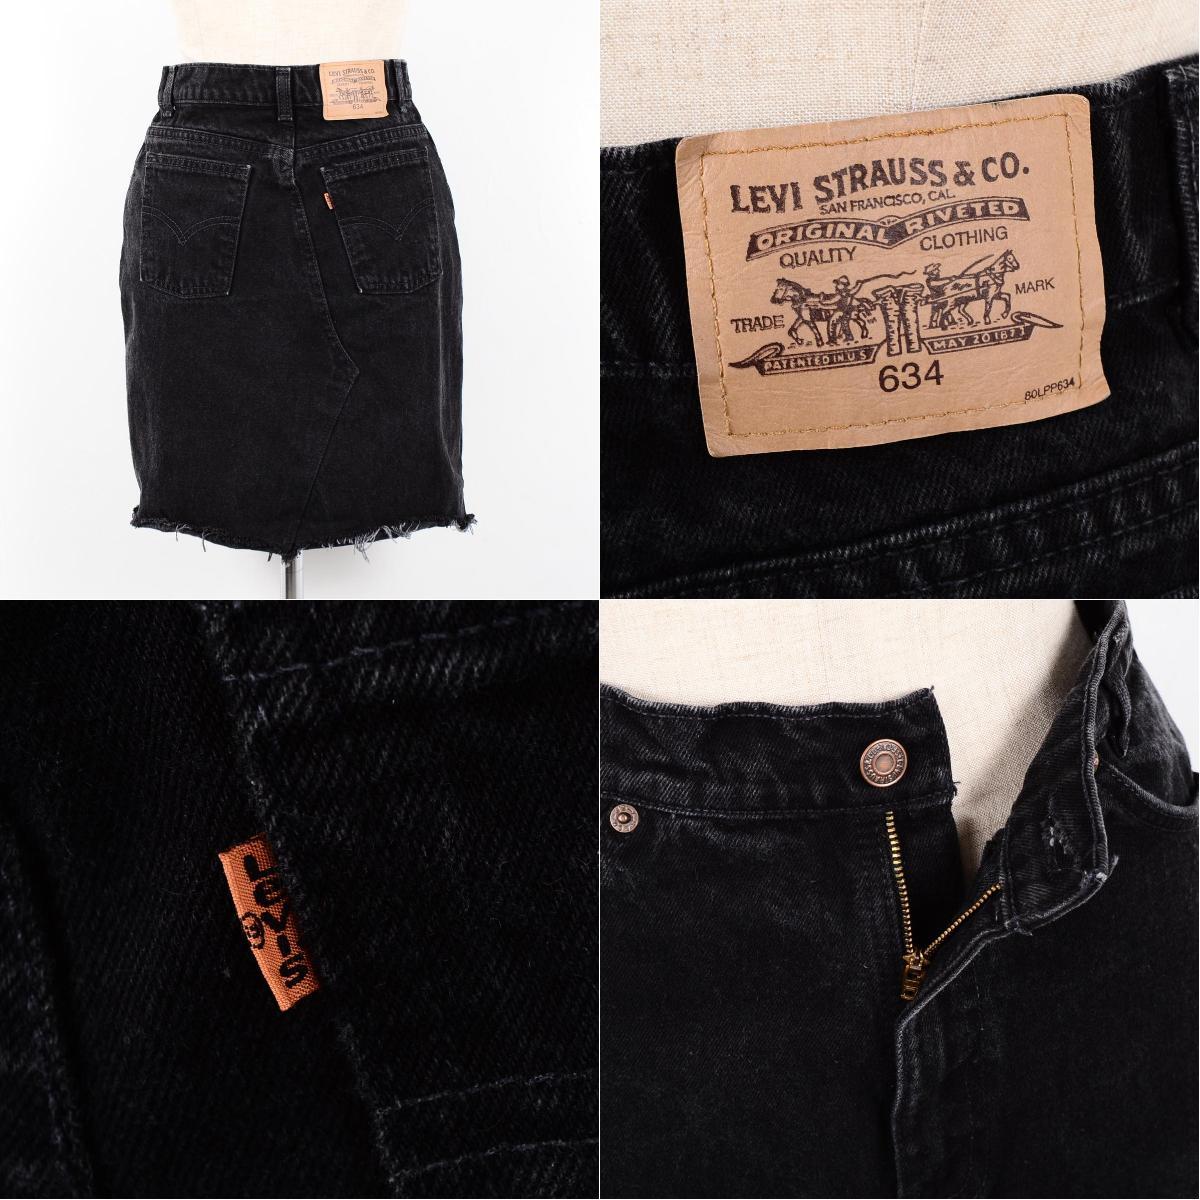 VINTAGE CLOTHING JAM TRADING | Rakuten Global Market: Levis 634 ...